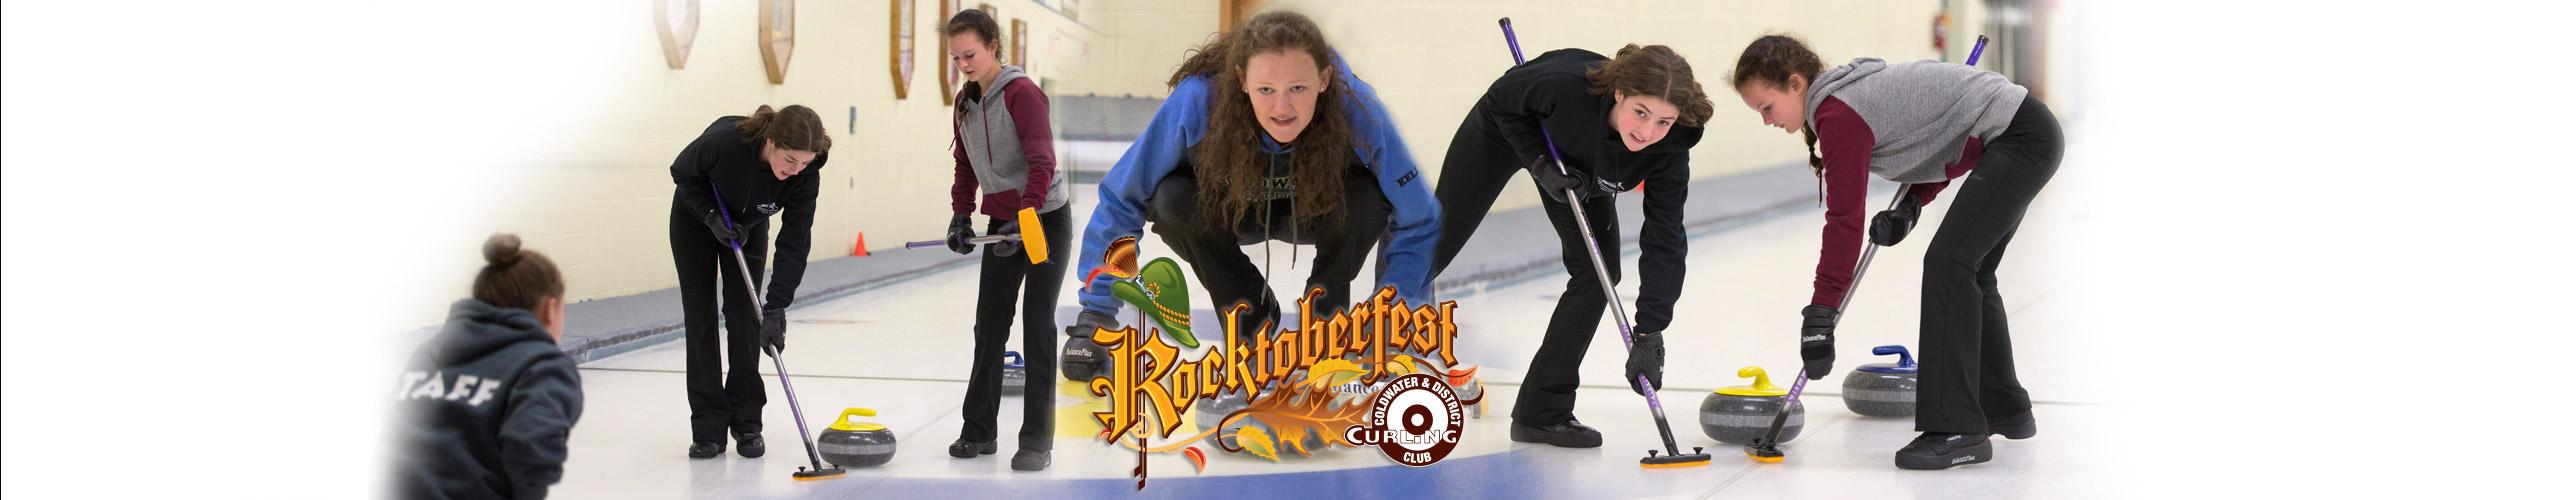 rocktoberfest-2017-banner04